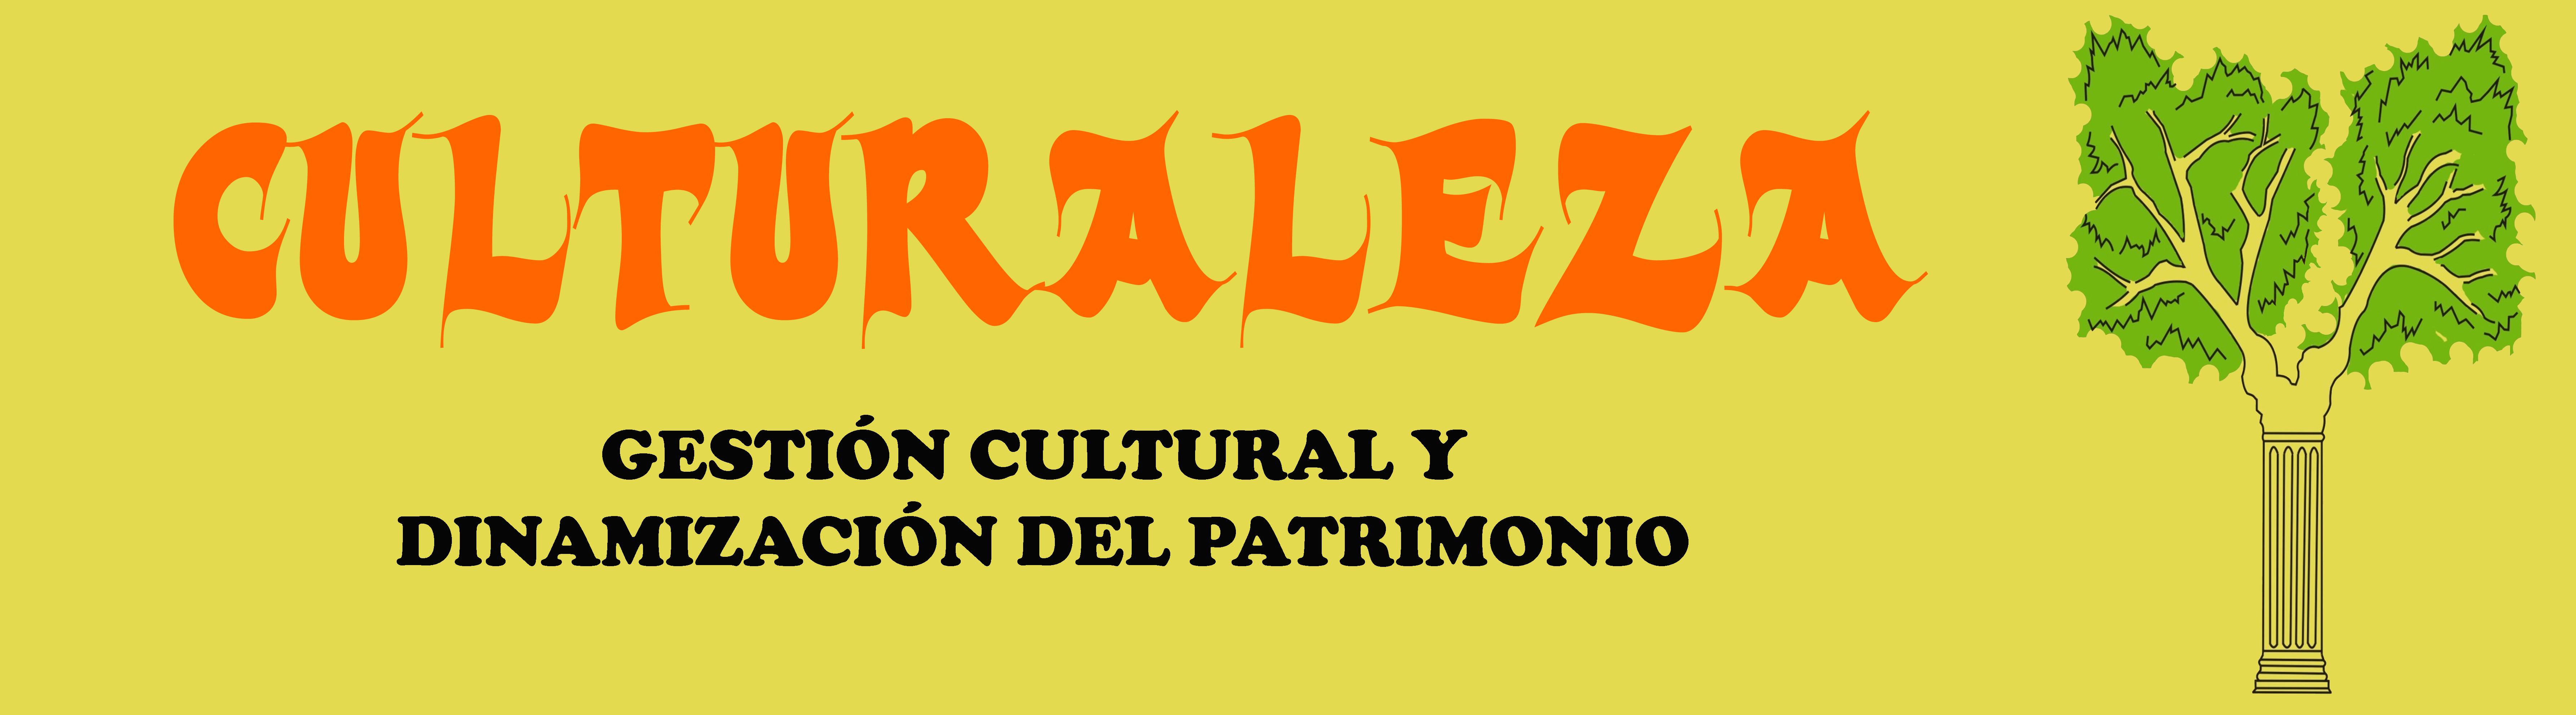 Culturaleza